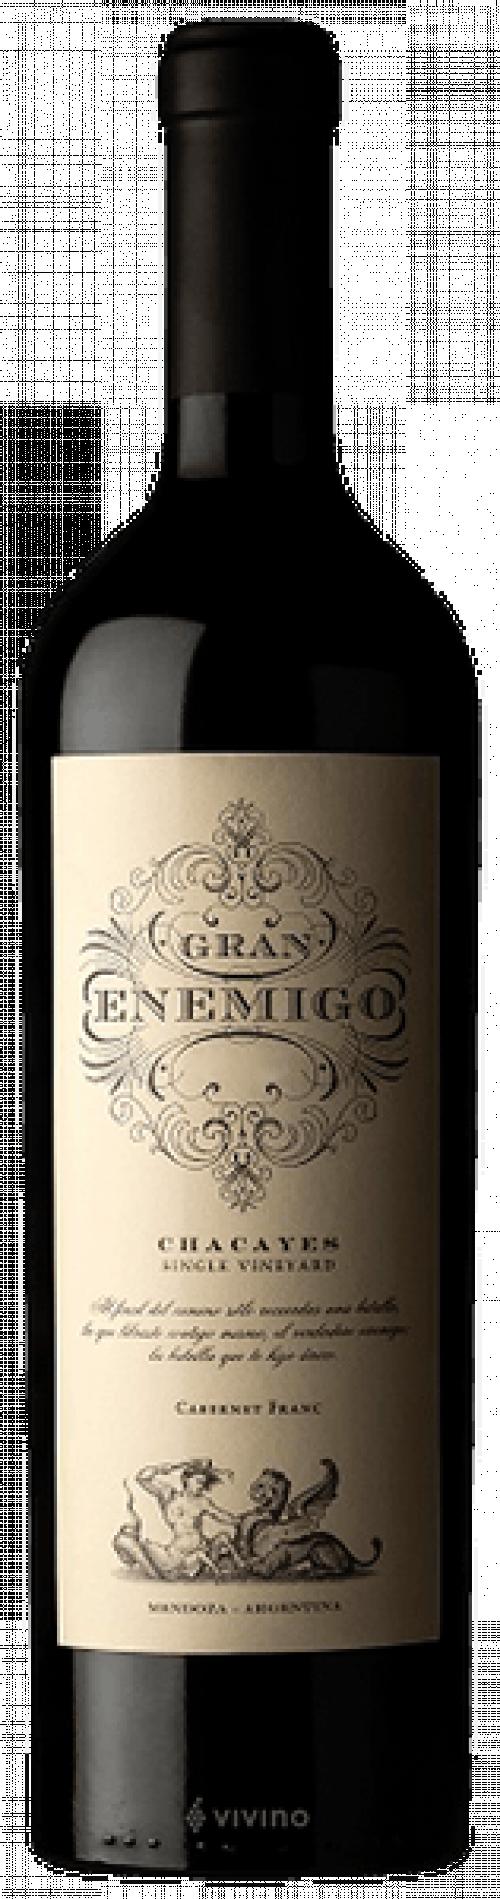 2016 Gran Enemigo Chacayes Single Vineyard Cabernet Franc 750ml